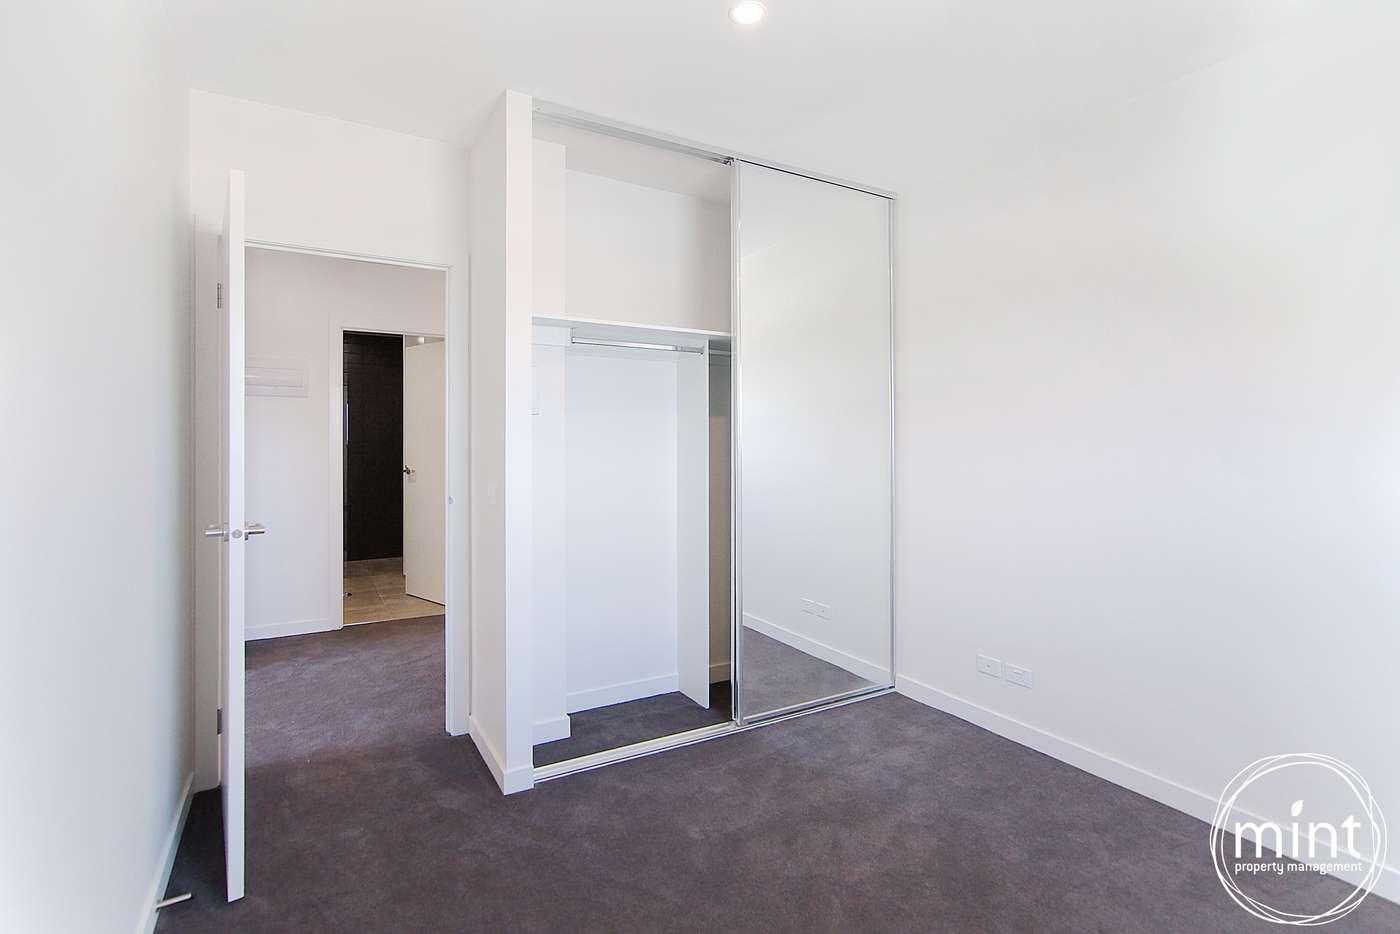 Sixth view of Homely apartment listing, 510/86 La Scala Avenue, Maribyrnong VIC 3032